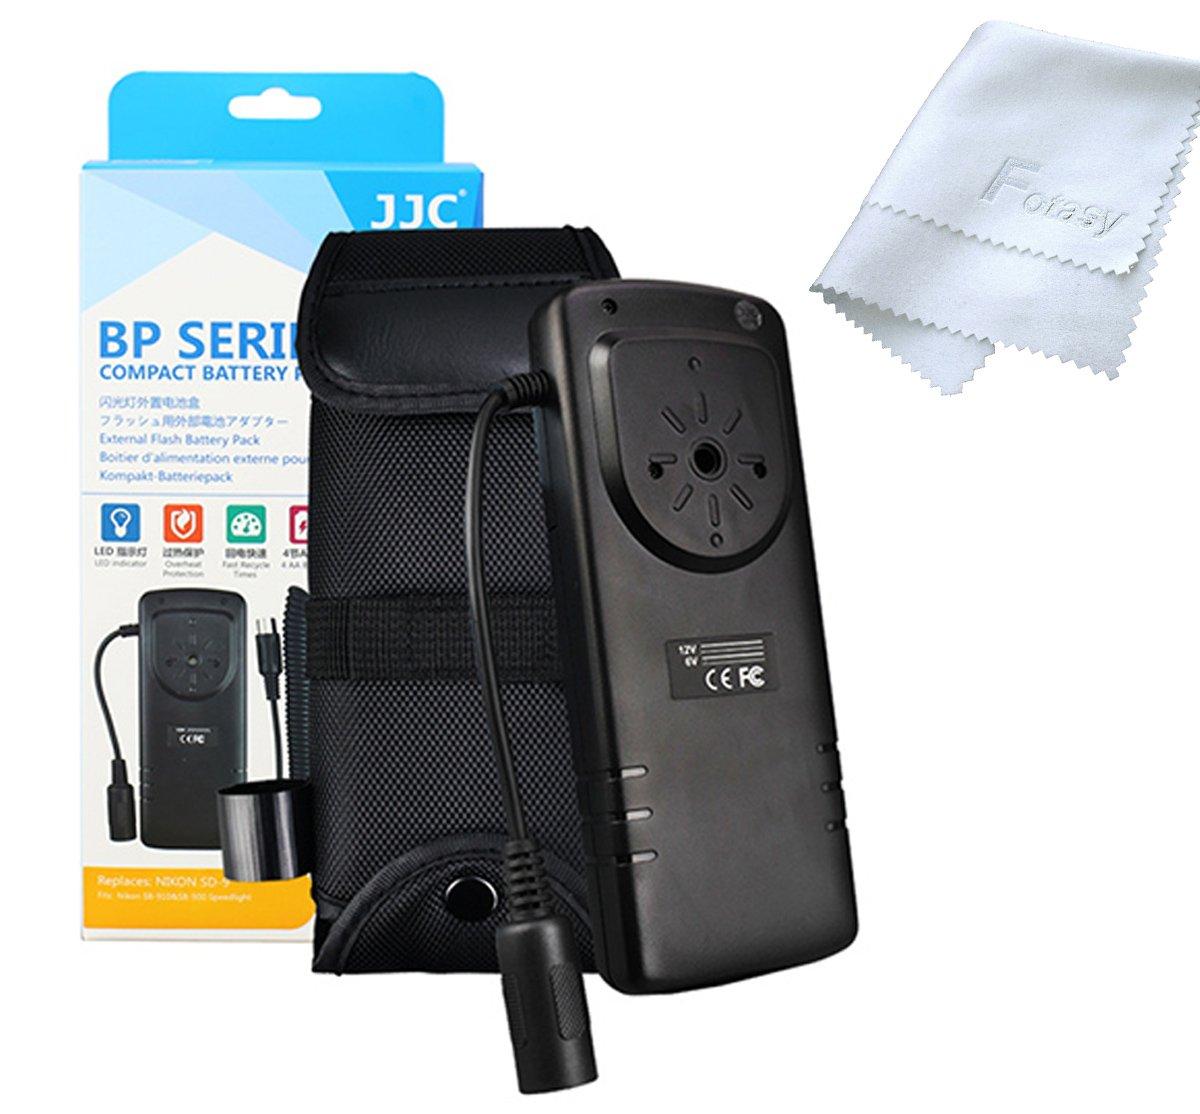 JJC BP-NK1 Pro External Flash Battery Pack Replaces NIKON SD-9, for Nikon Flash SB-910 / SB-900 / SB-5000